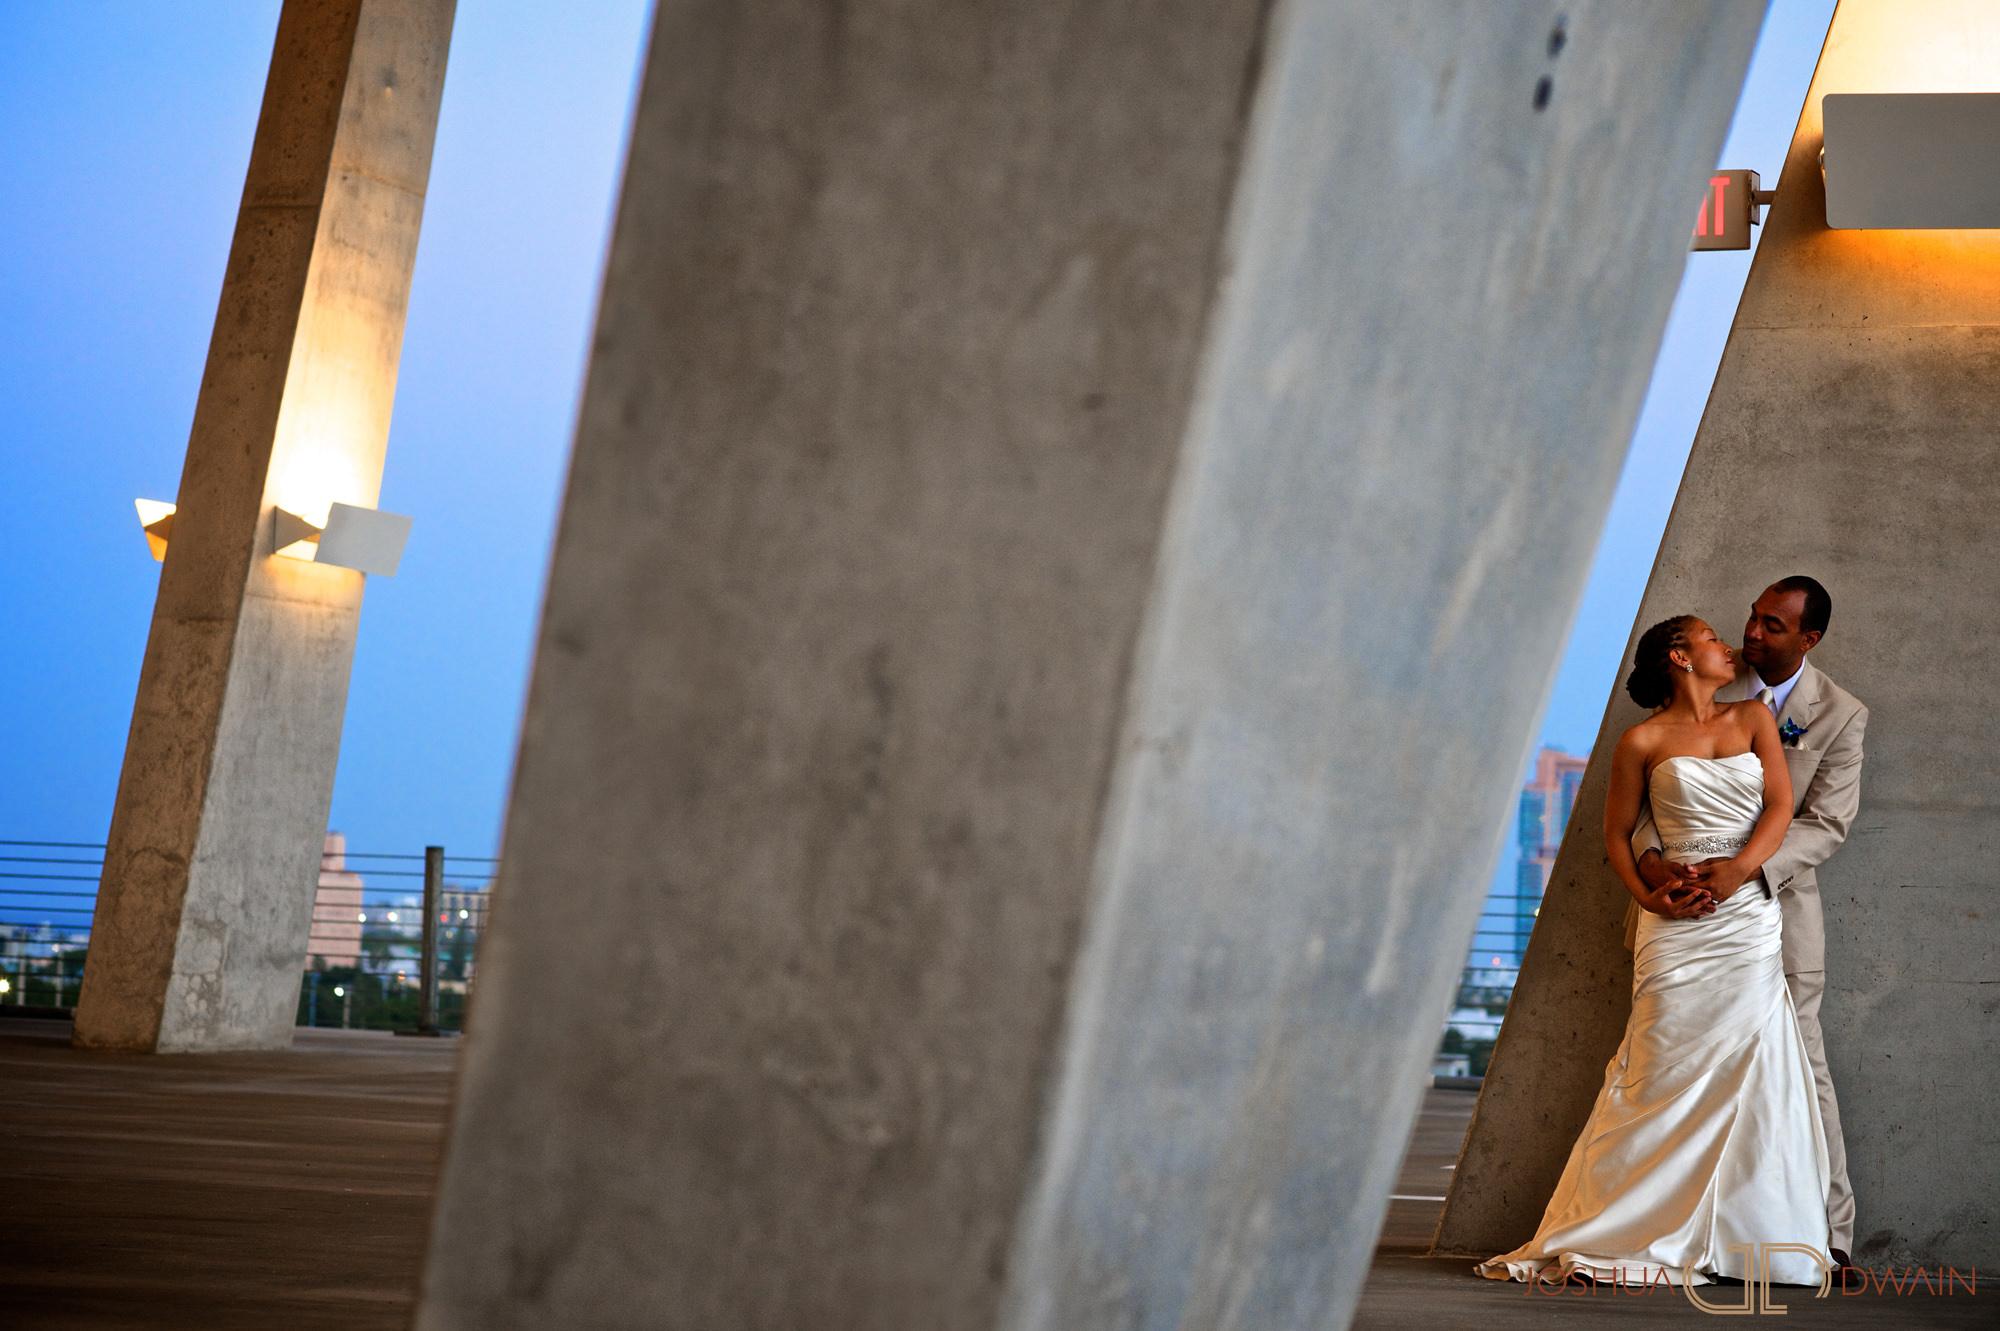 candra-alonza-018-holiday-inn-south-beach-miami-wedding-photographer-joshua-dwain-2012-07-29_ca_545